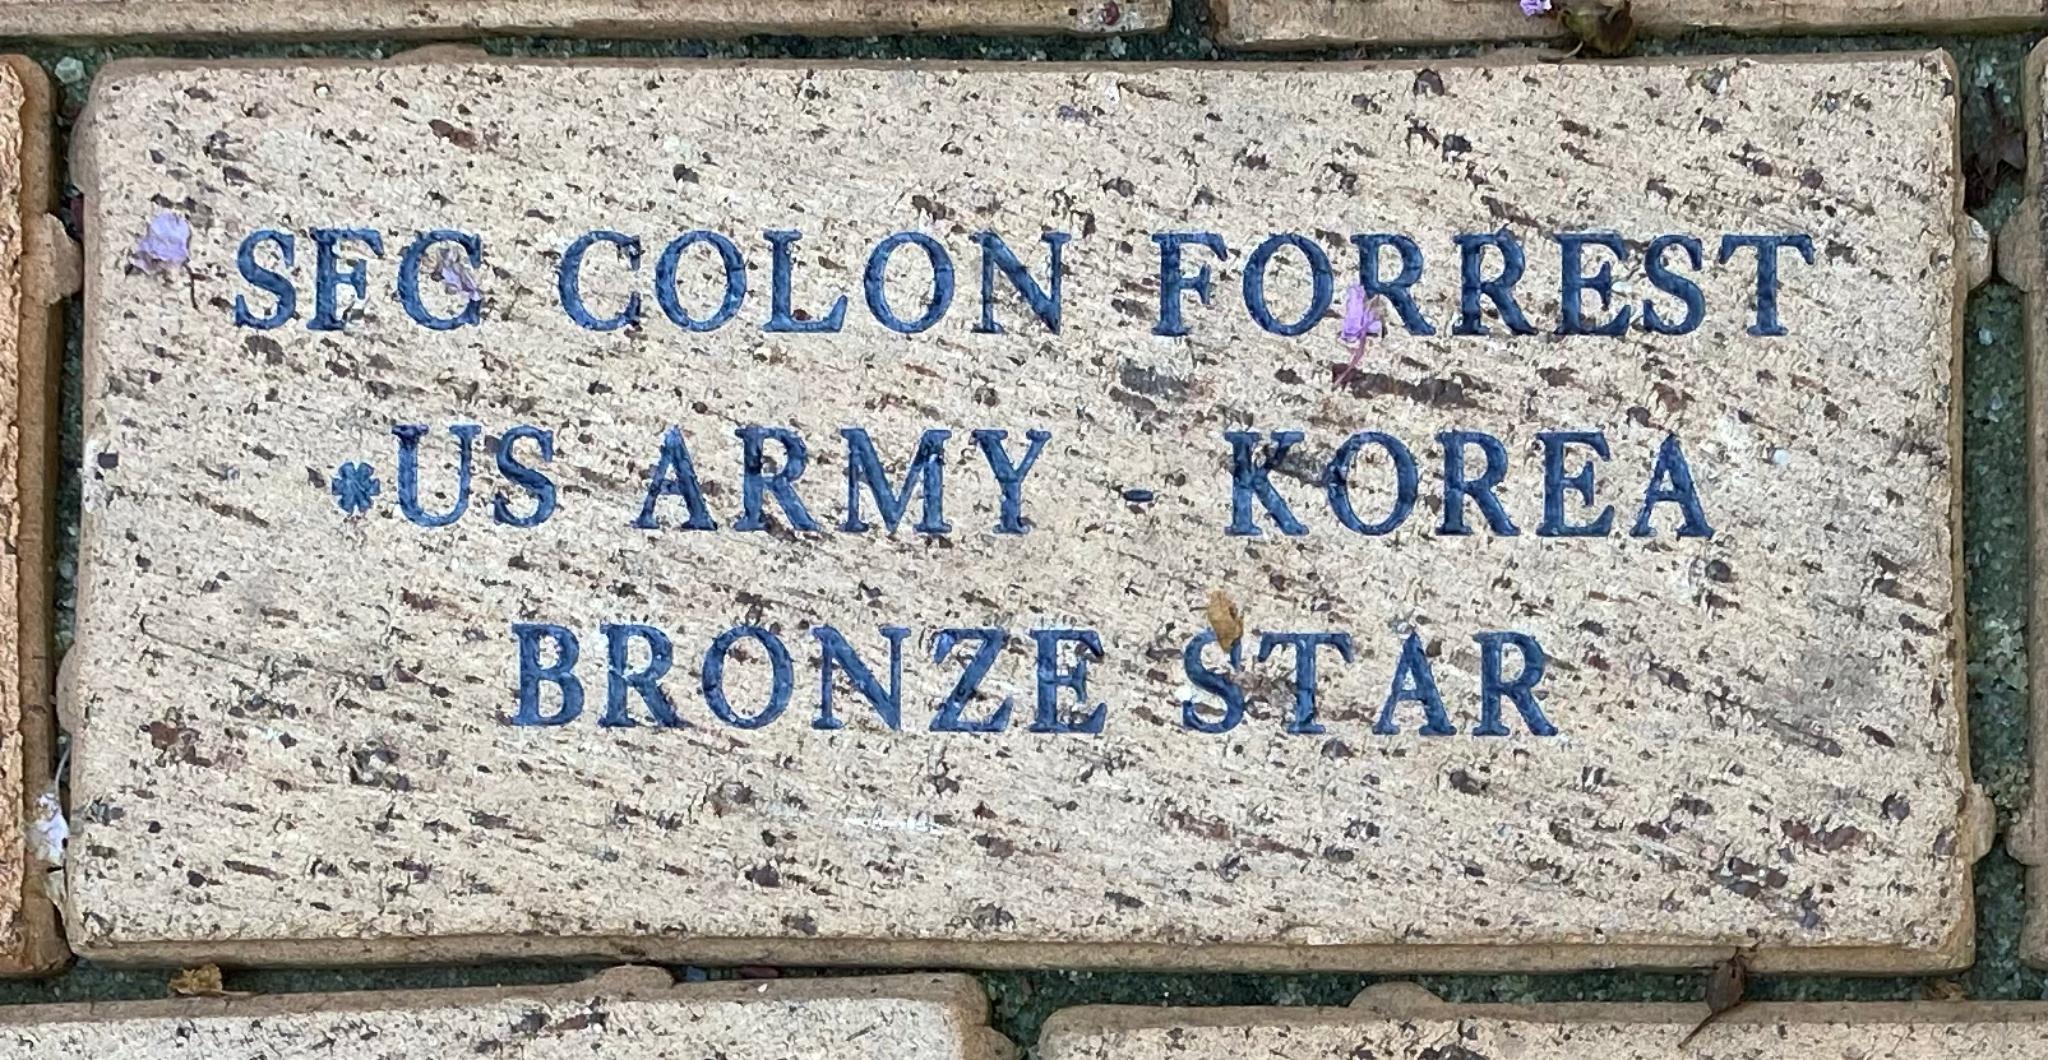 SFC COLON FORREST US ARMY – KOREA BRONZE STAR